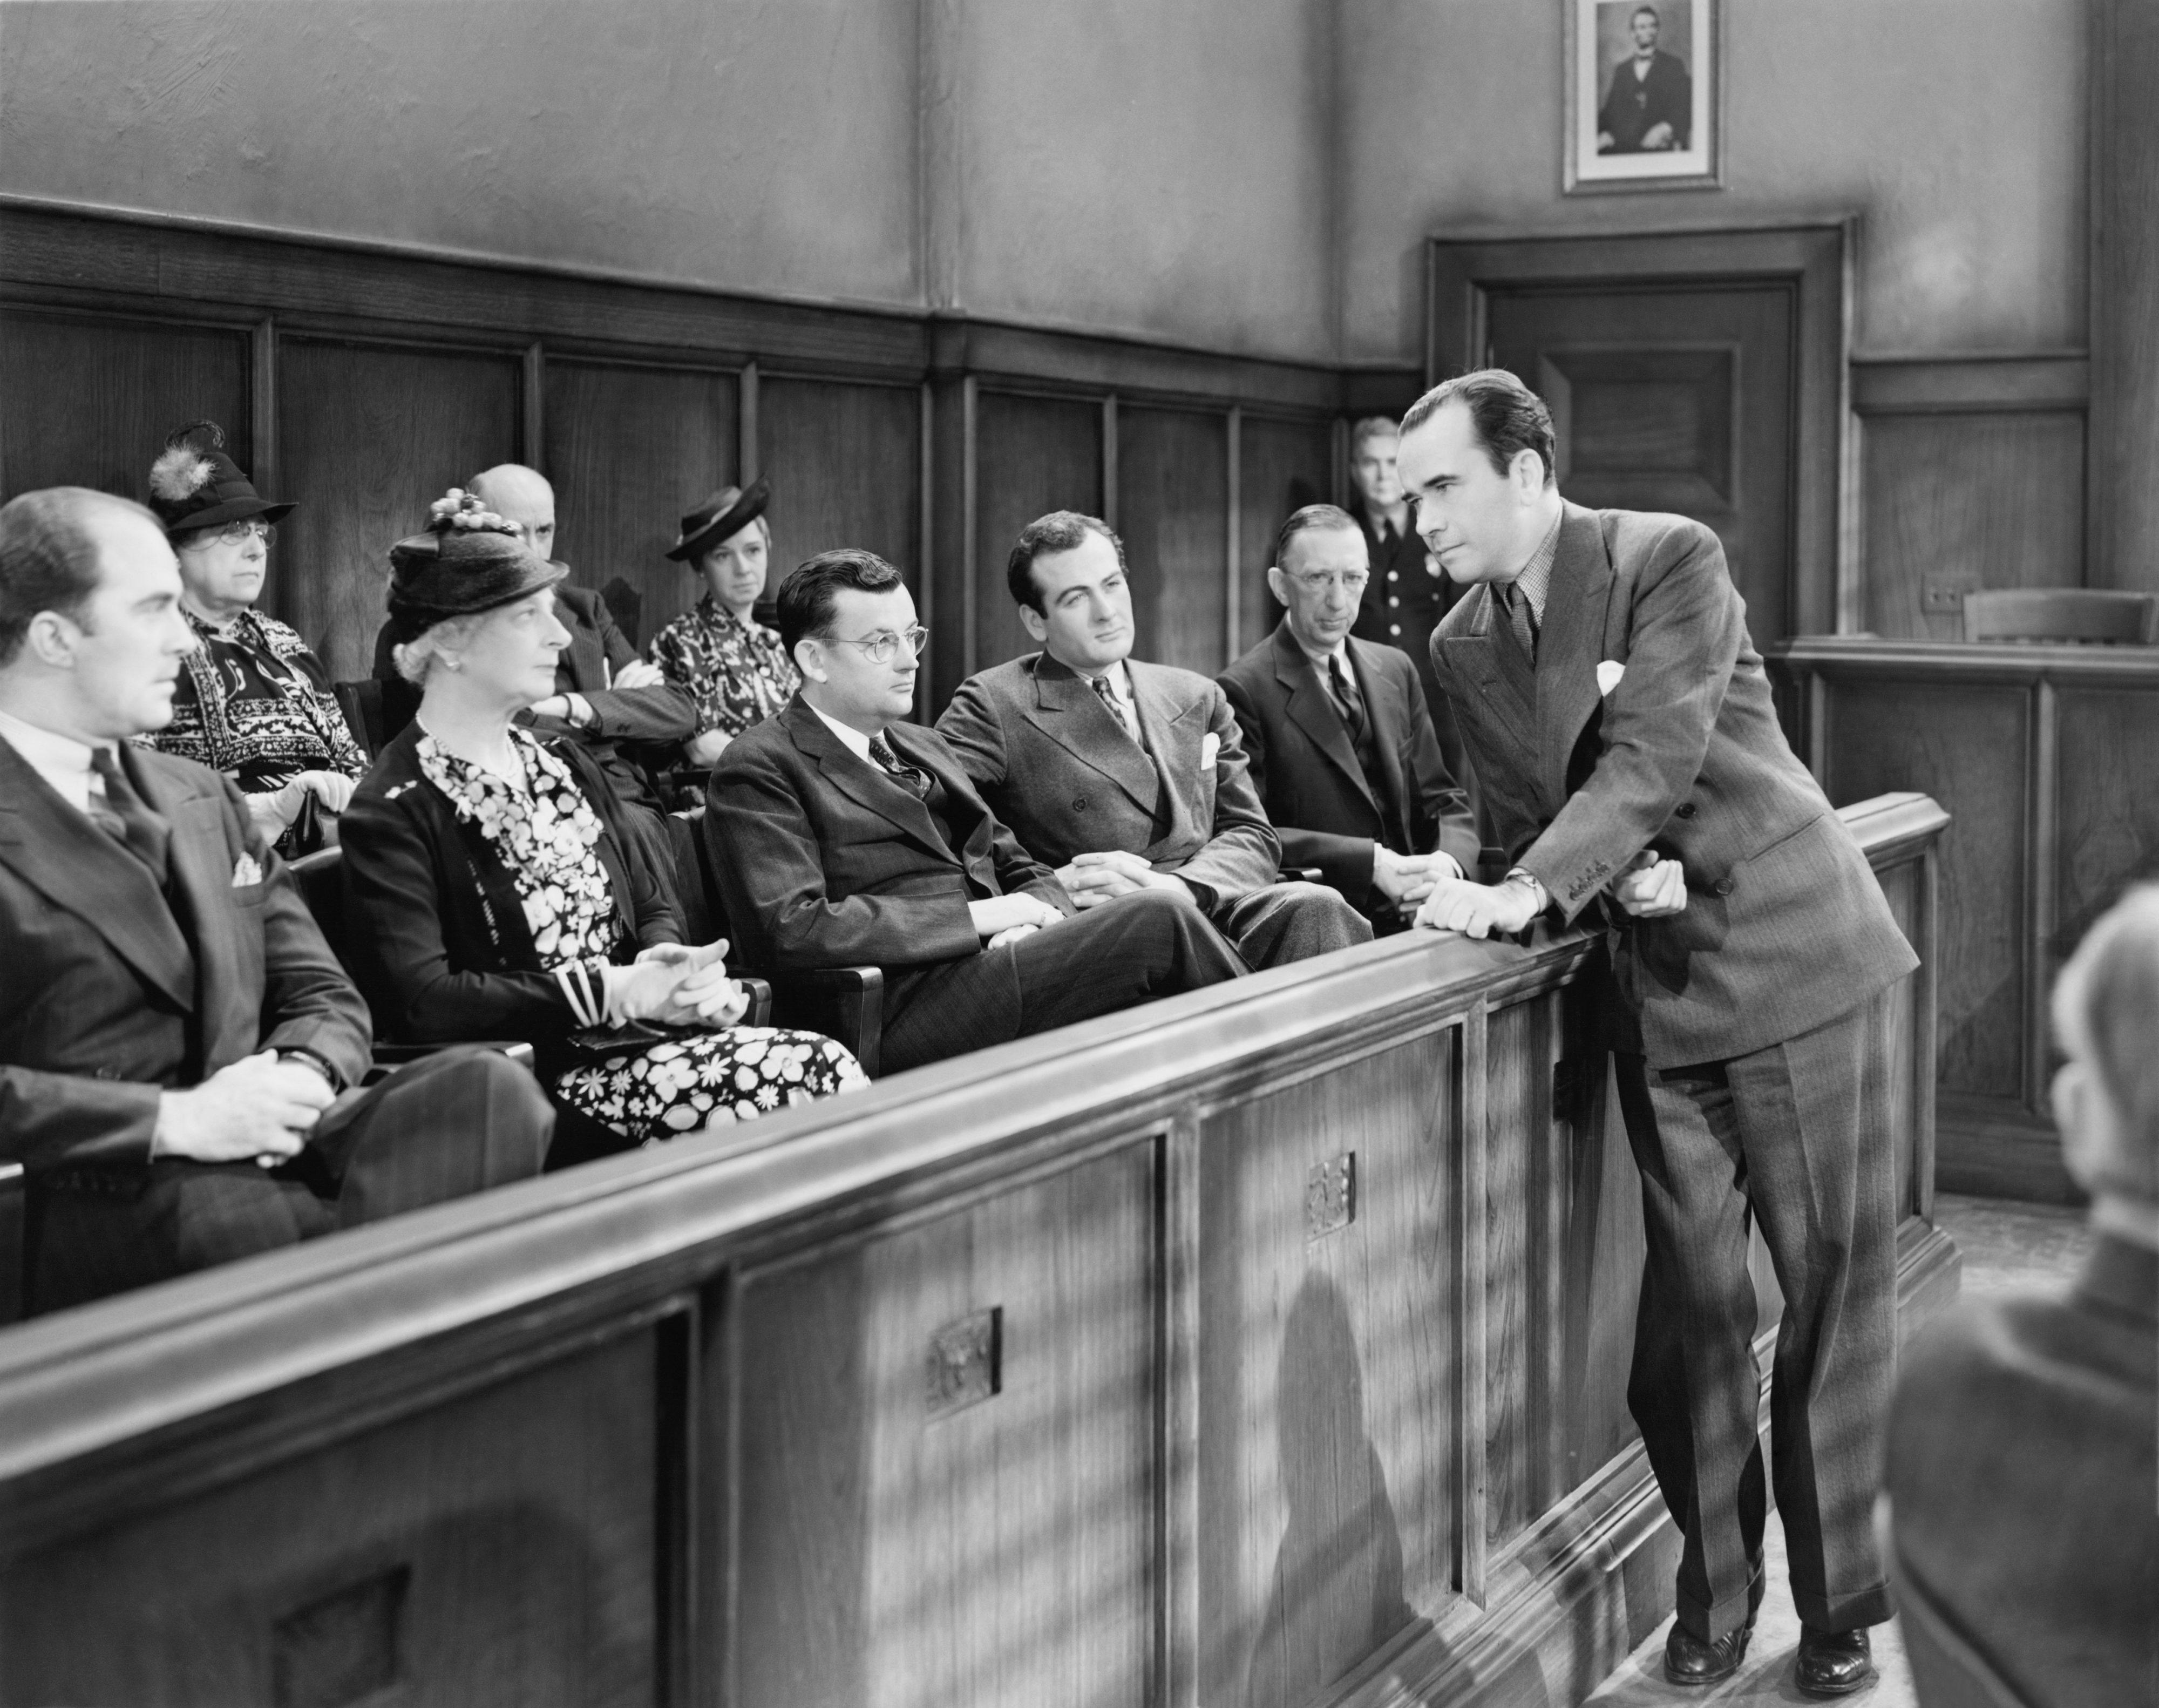 jury-trial-4000x3164.jpeg